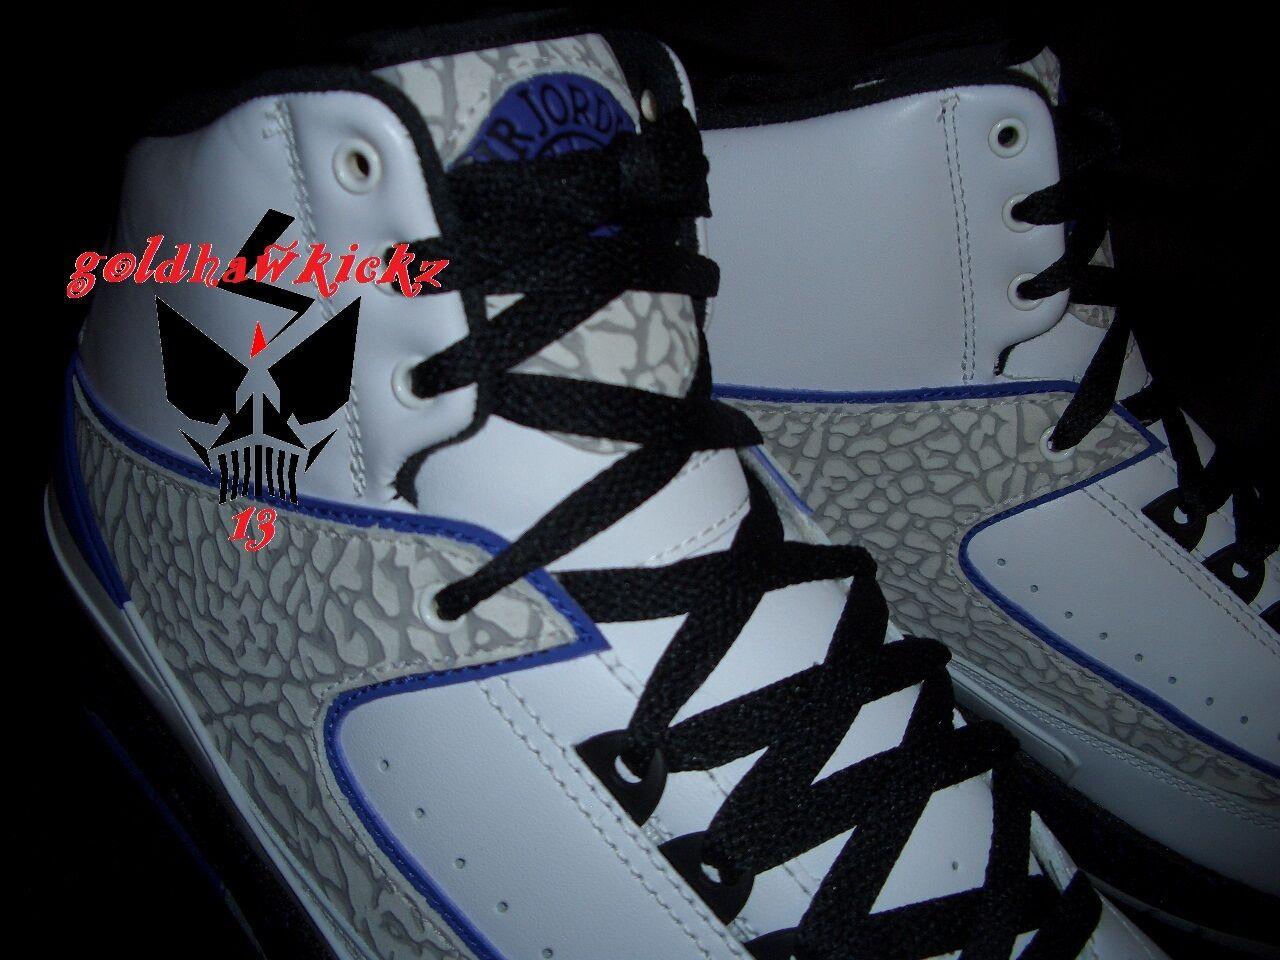 Nike Air Jordan II 2 retro retro retro Concords cement nero Dark Concord 385475-153 SALE b13dec